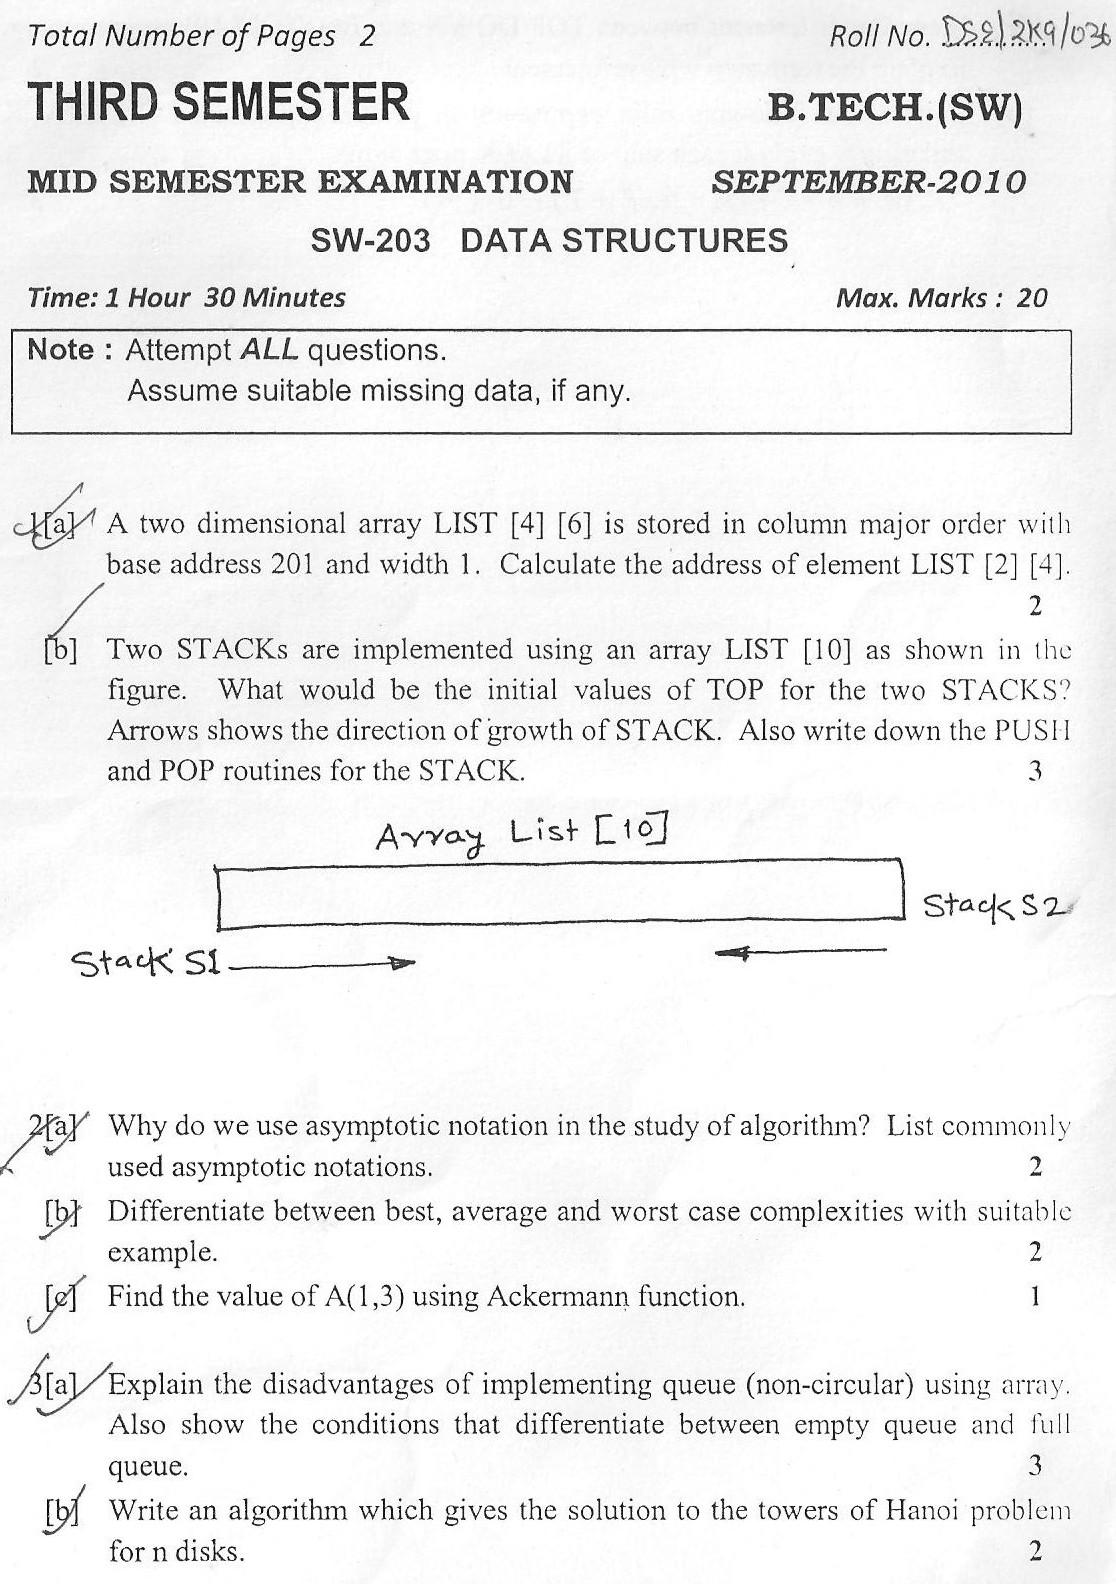 DTU Question Papers 2010 – 3 Semester - Mid Sem - SW-203